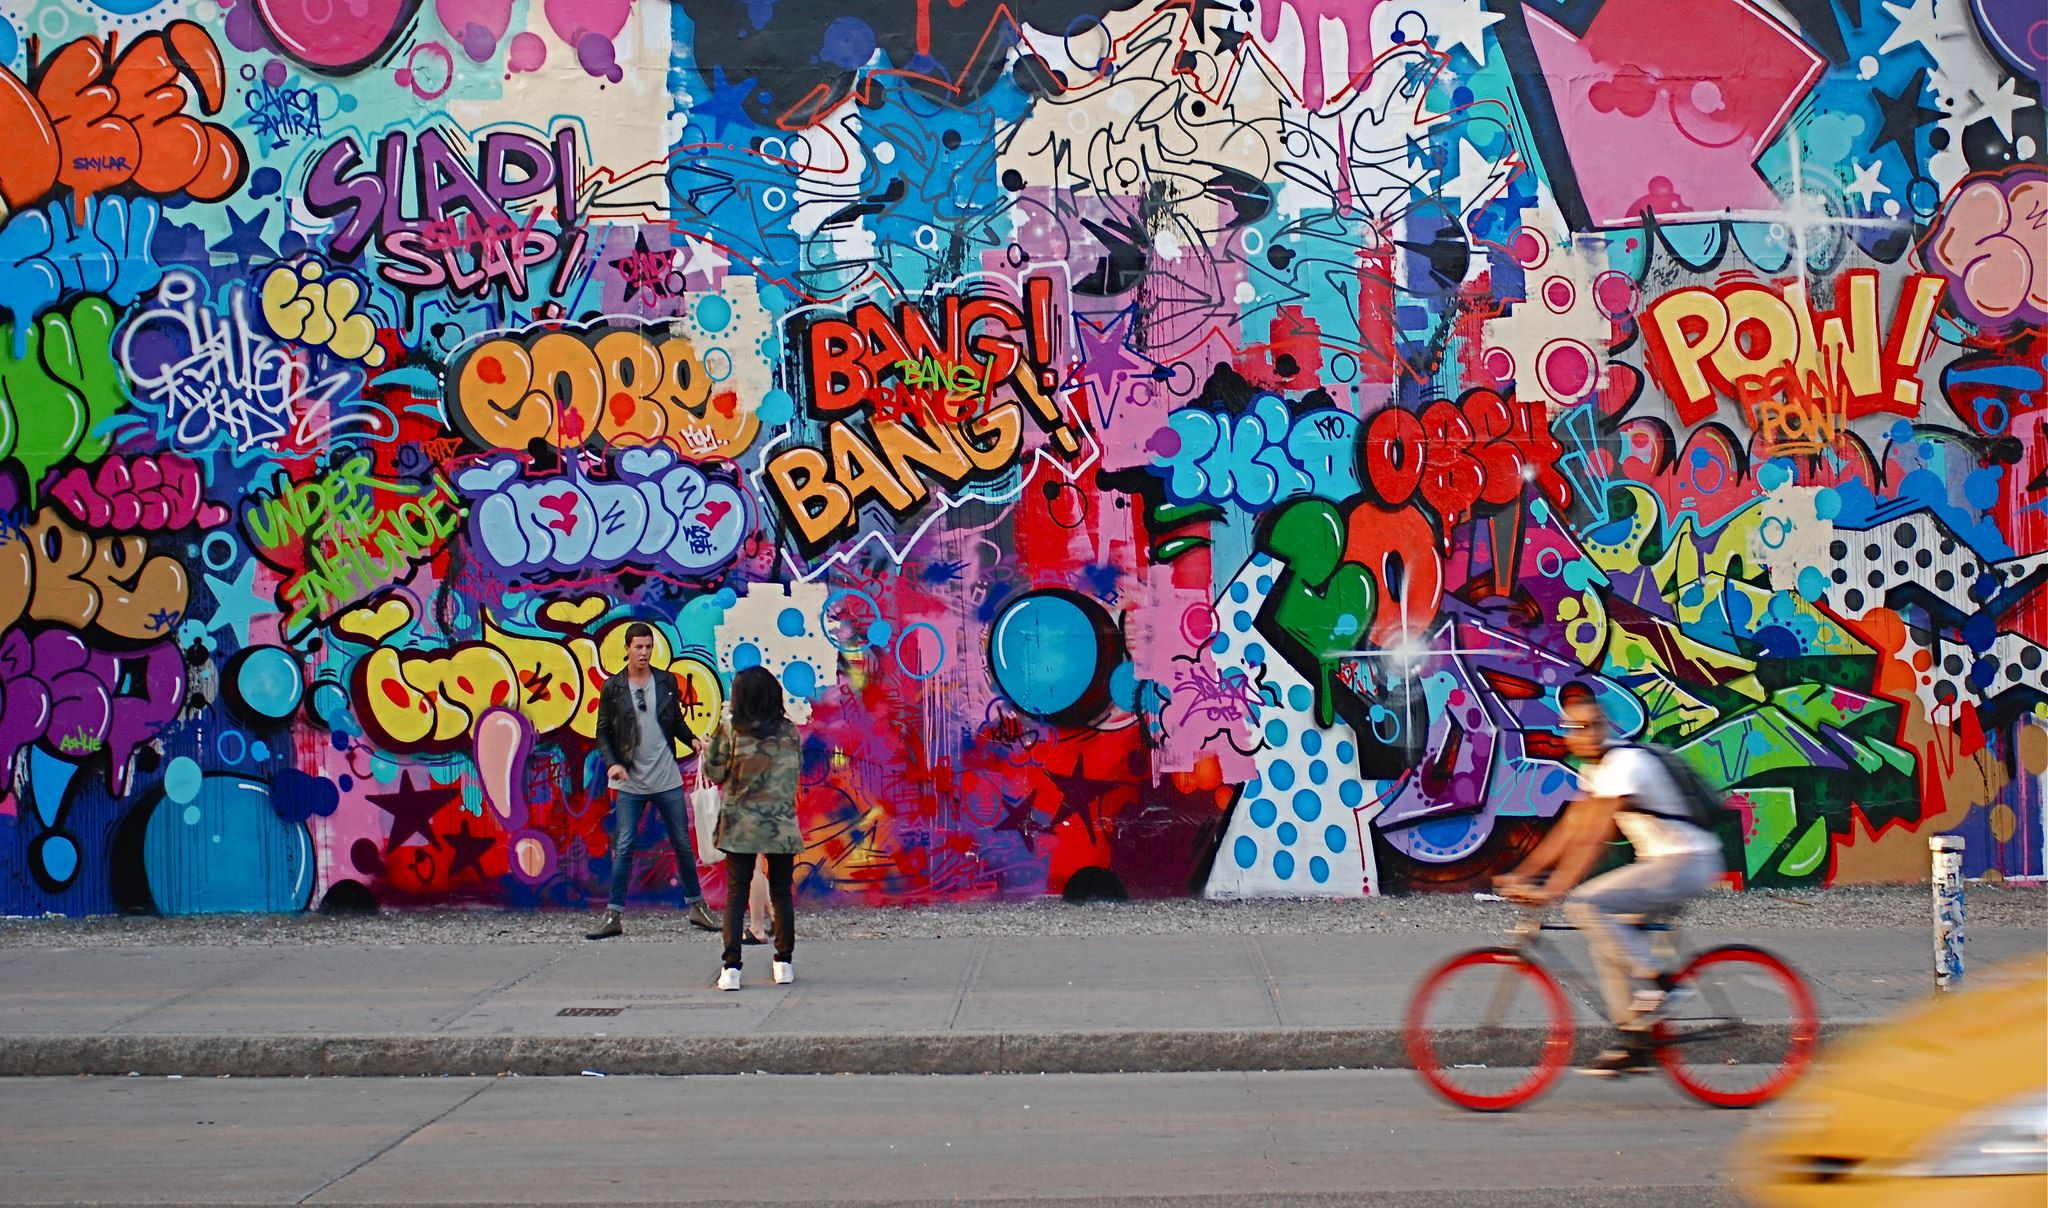 Zimmerwand graffiti nyc  nyc revok and pose mural at bowery and houston graffiti wall